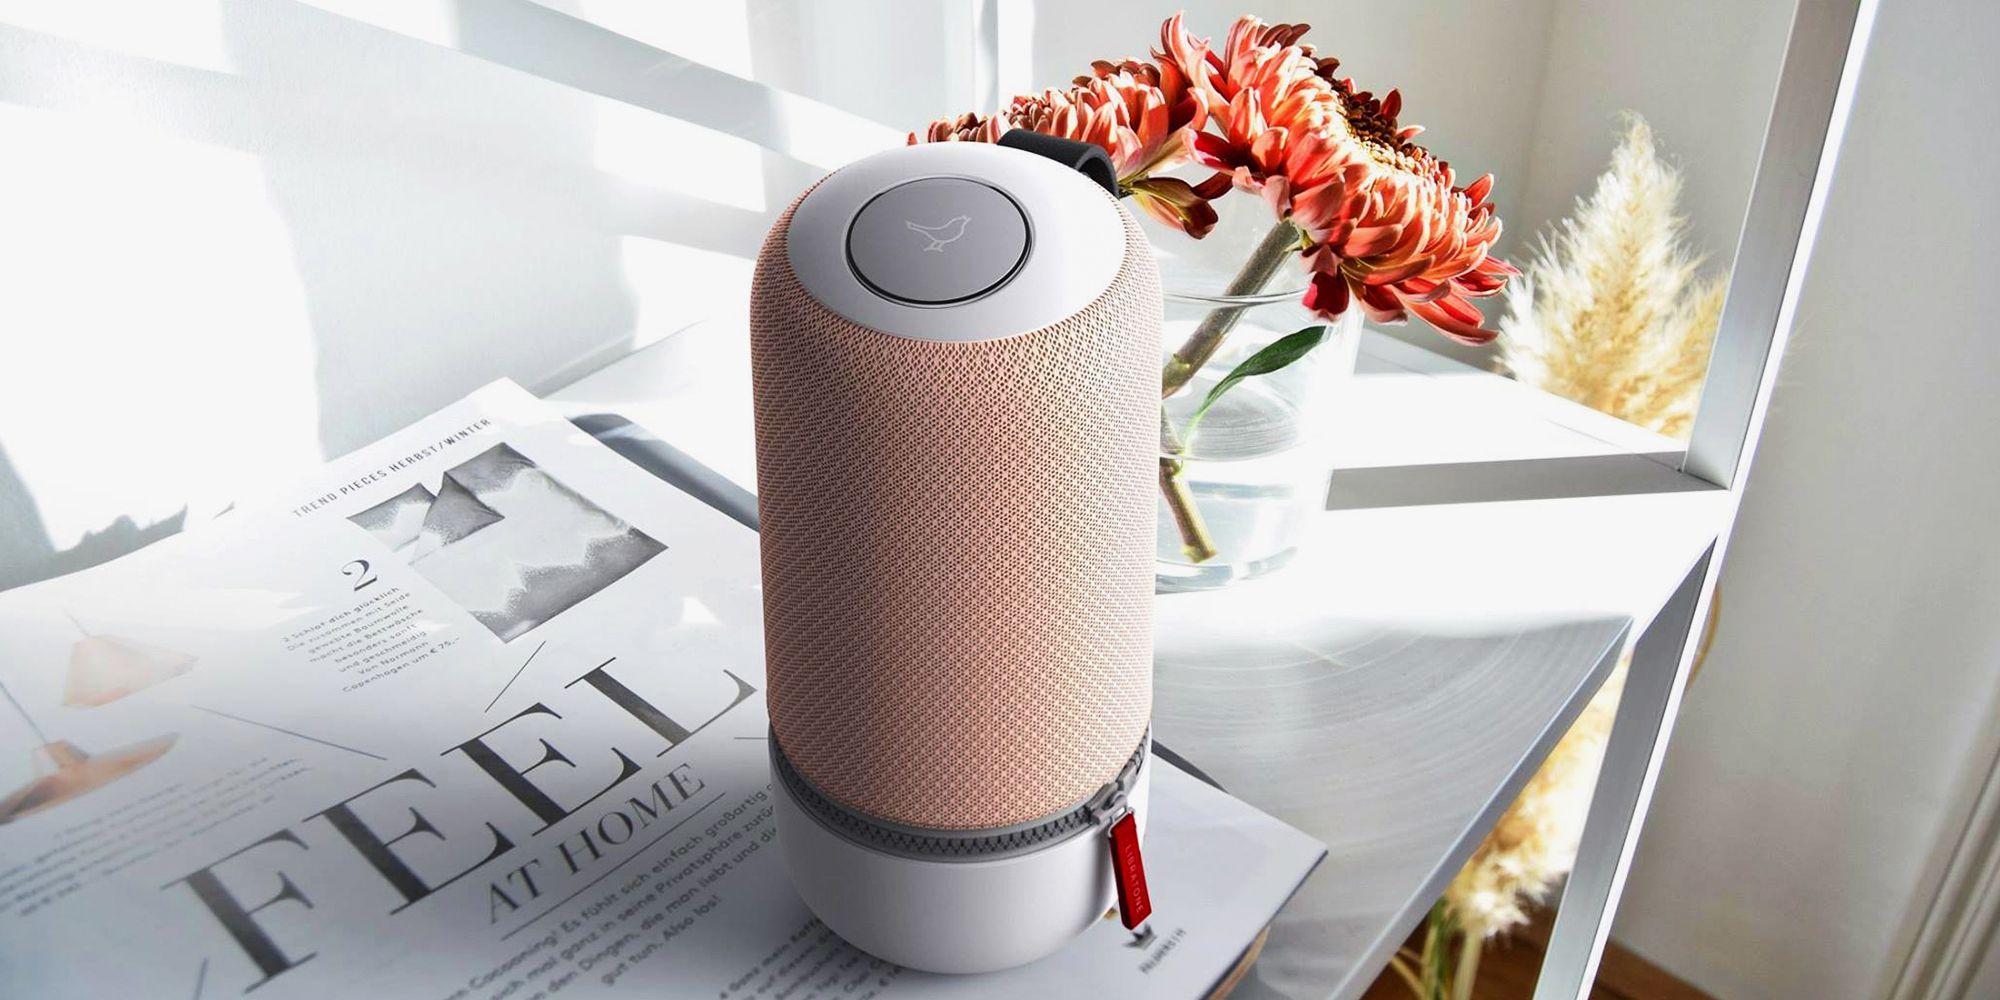 Libratone airplay speaker best of 2018